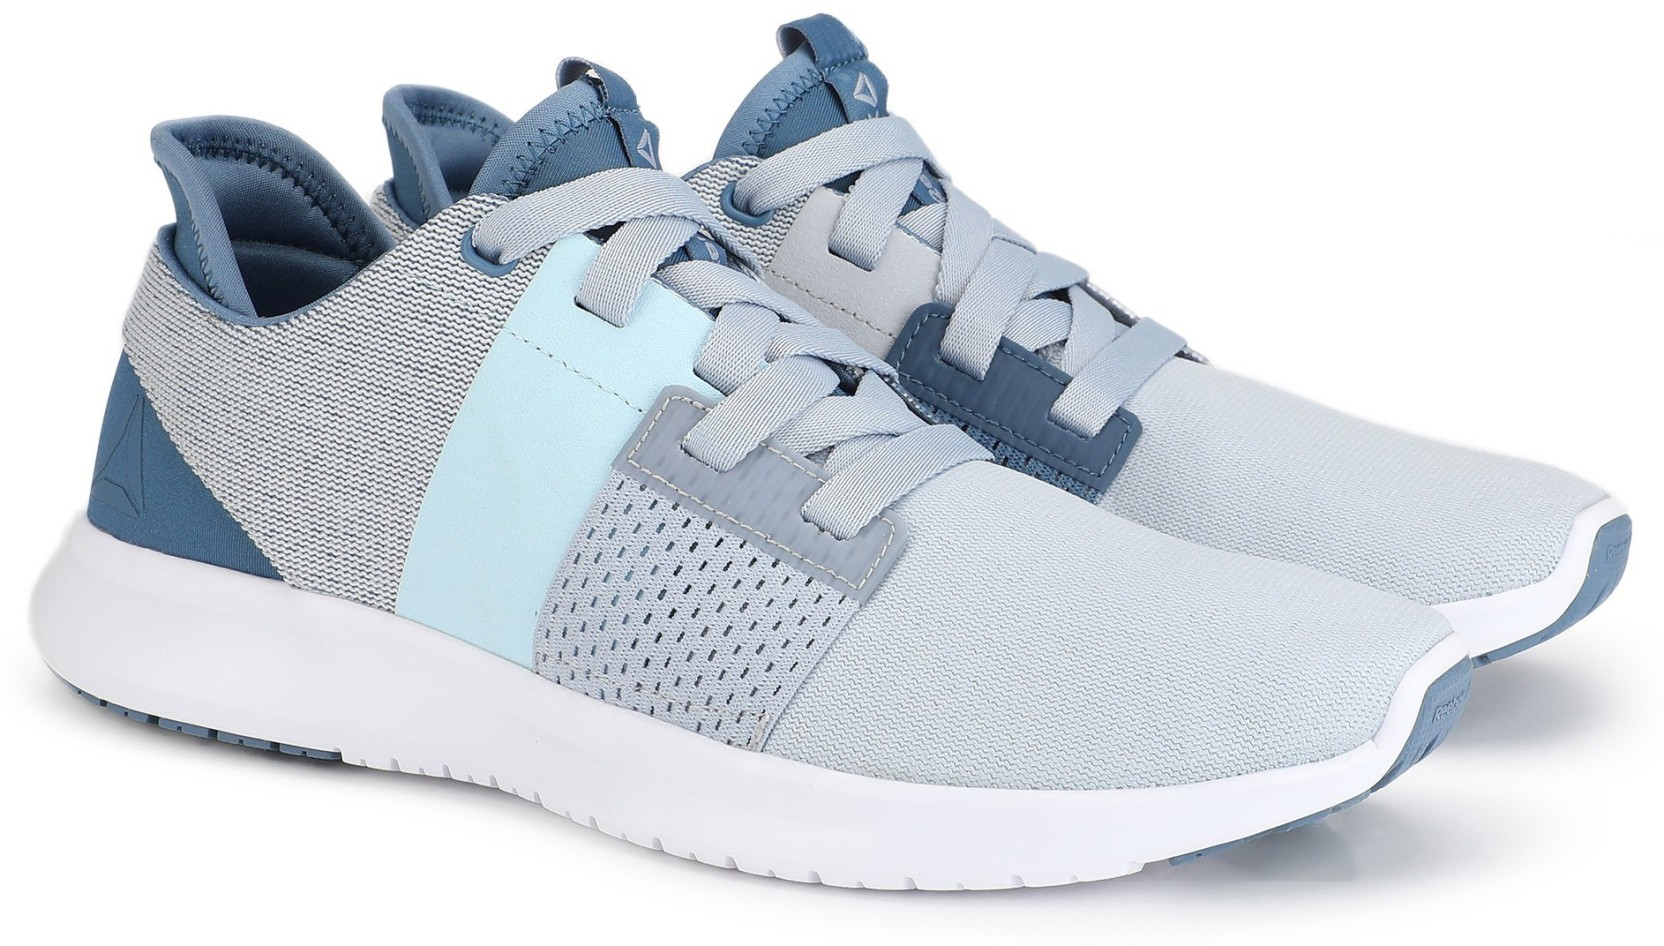 61f49f17f REEBOK REEBOK TRILUX RUN Running Shoes For Women - Buy BLUE GREY ...